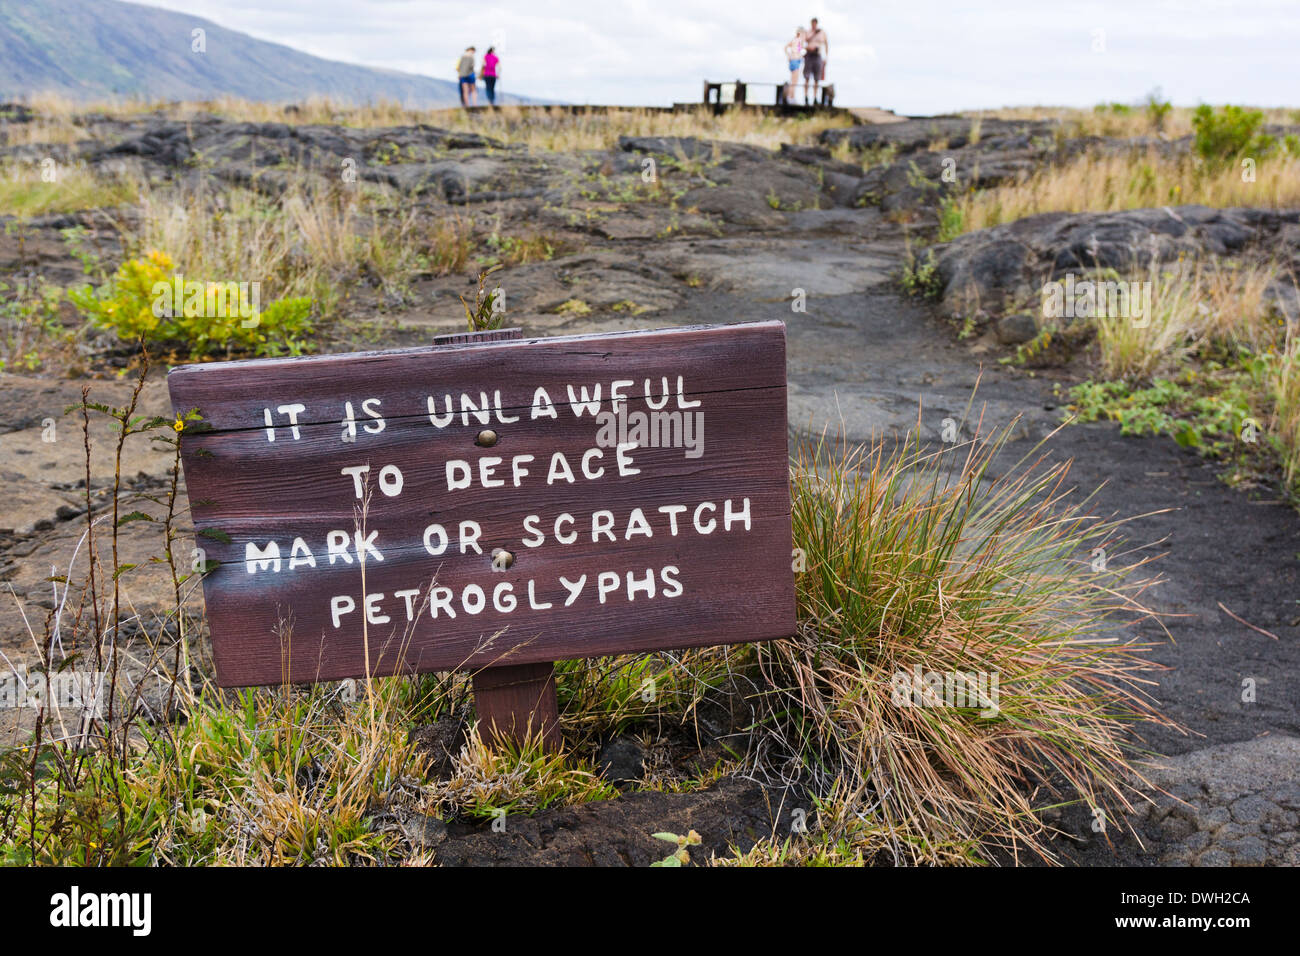 Sign 'It Is Unlawful To Deface Mark Or Scratch Petroglyphs'. Pu'u Loa Petroglyphs, Hawaii Volcanoes NP, - Stock Image